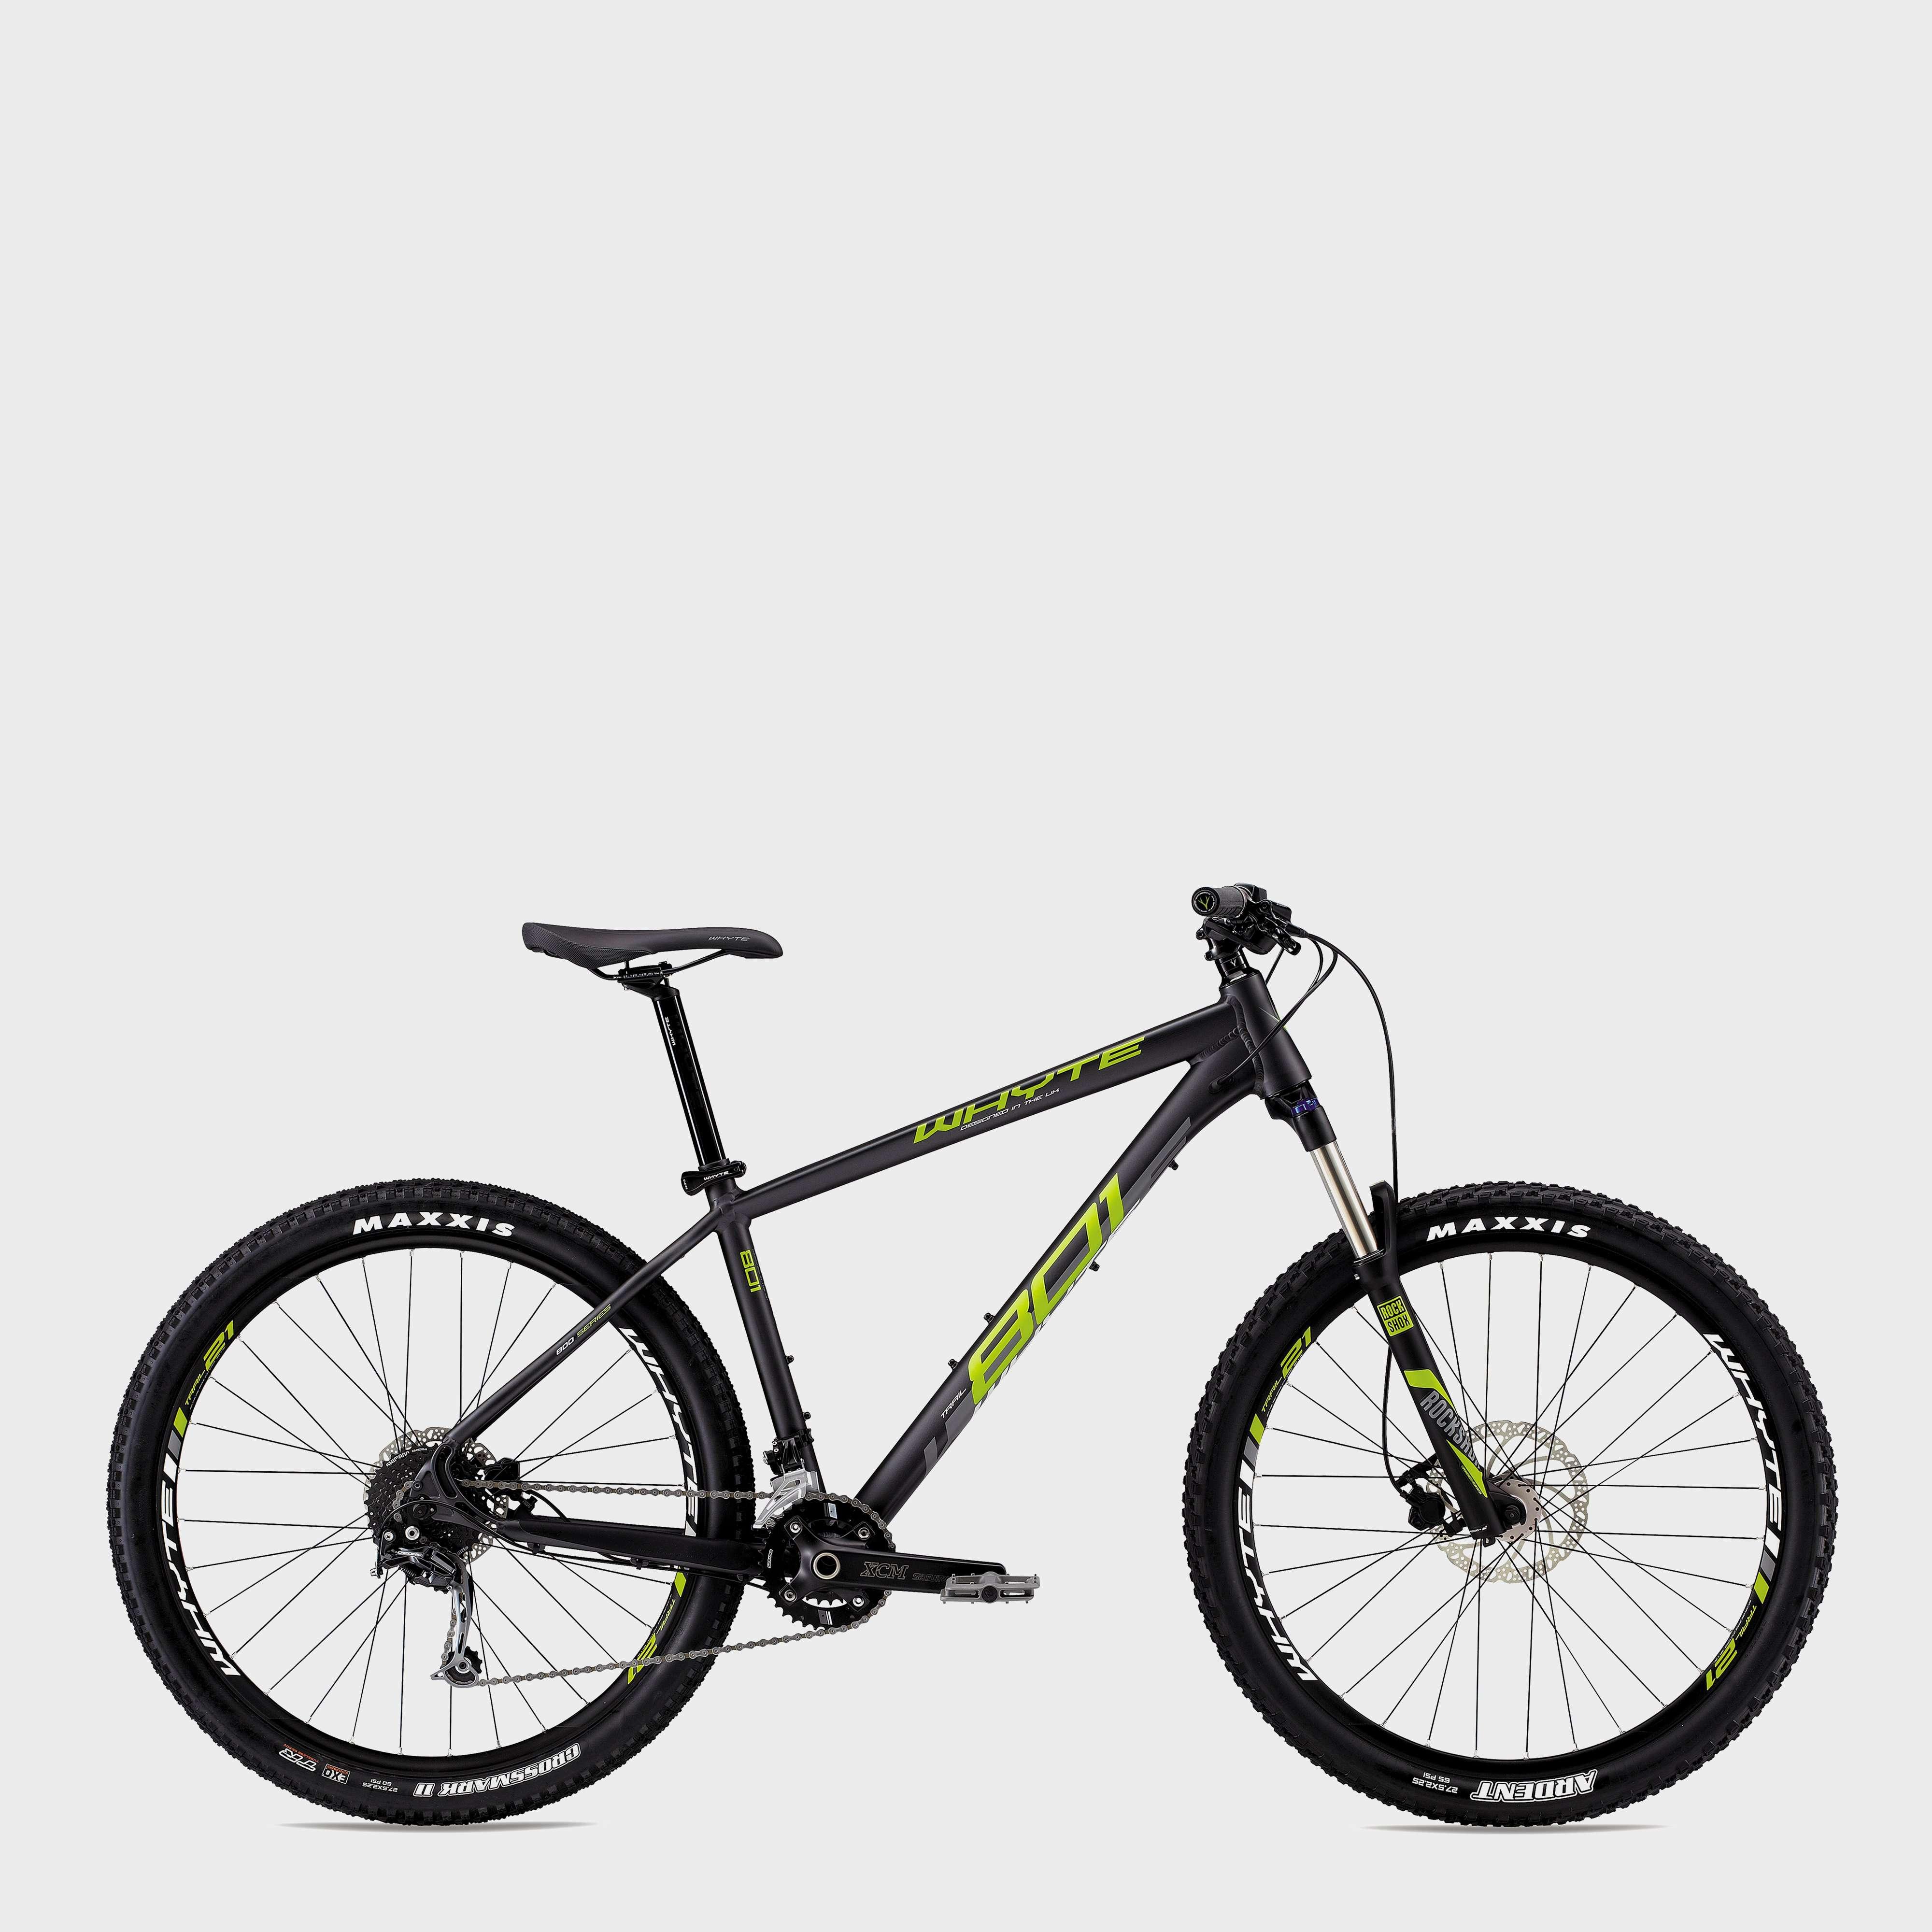 WHYTE BIKES 801 Hardtail Bike